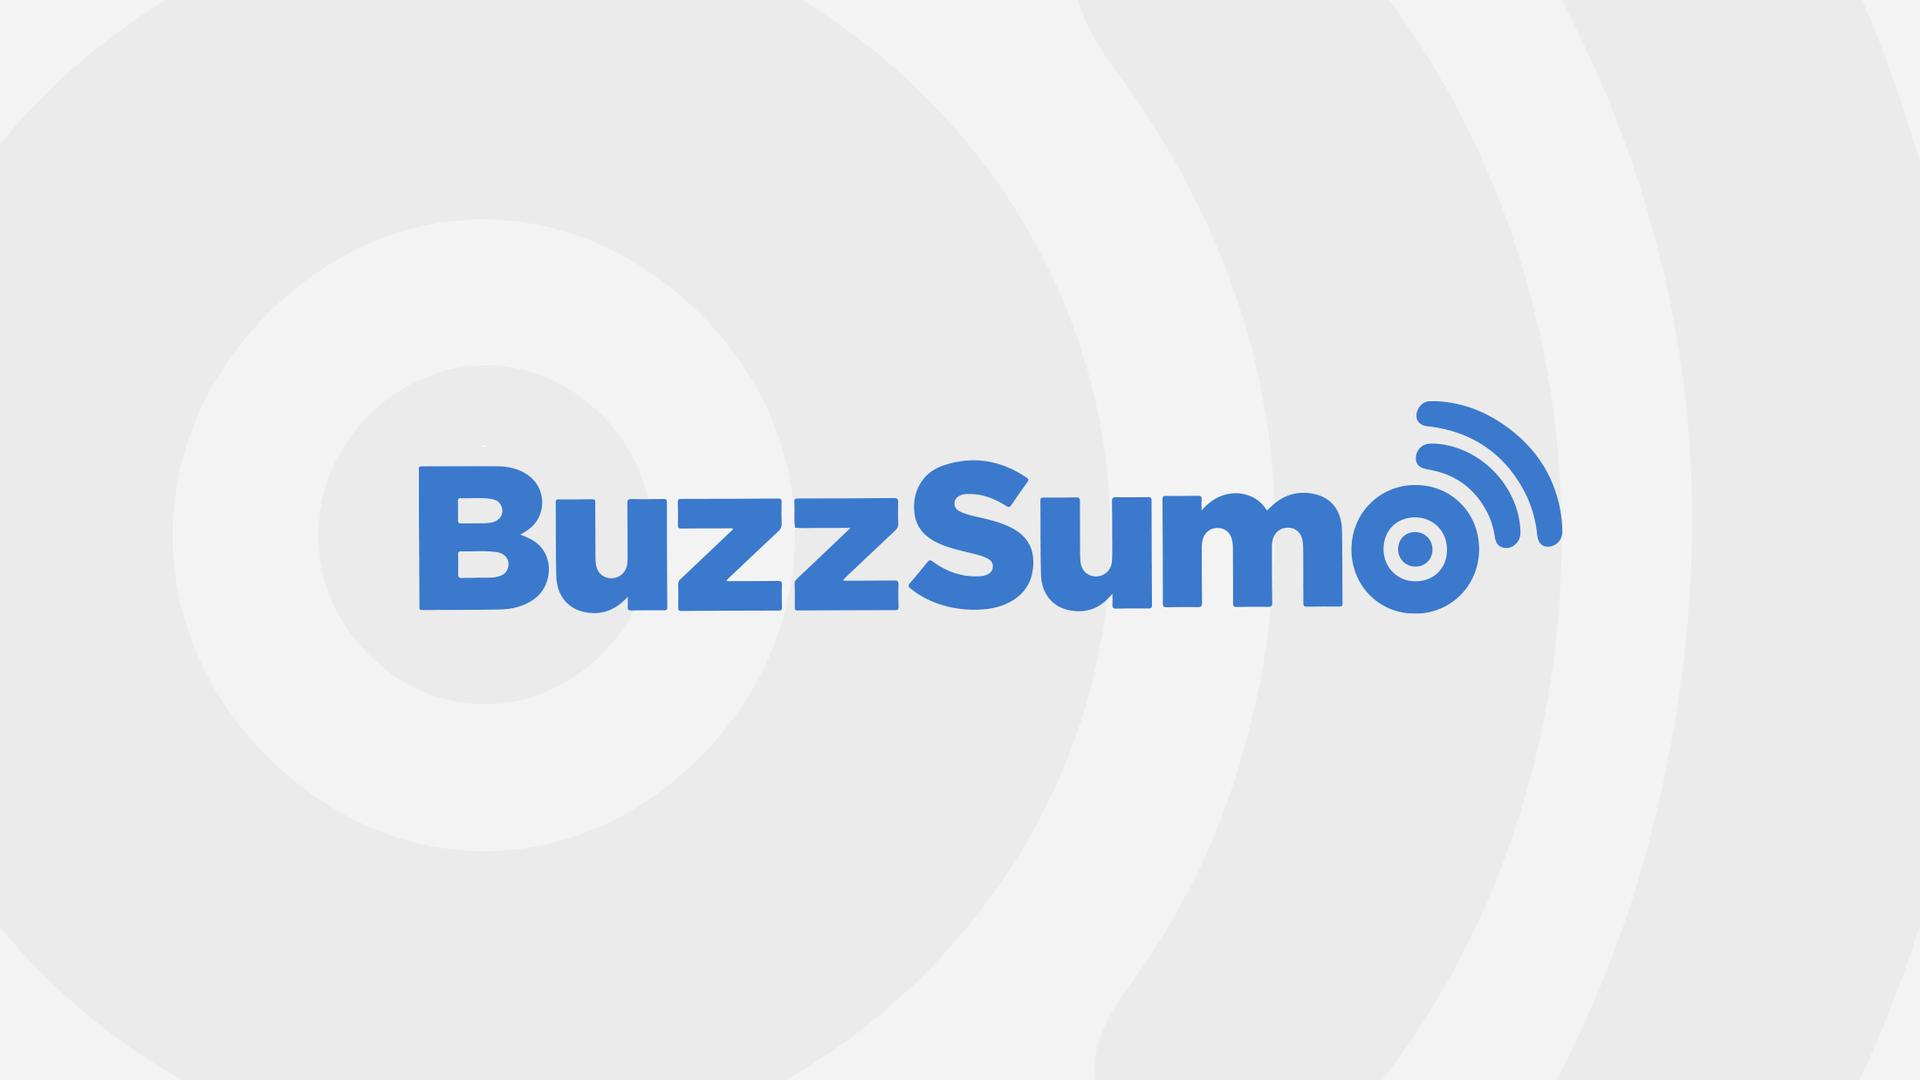 Buzzsumo images